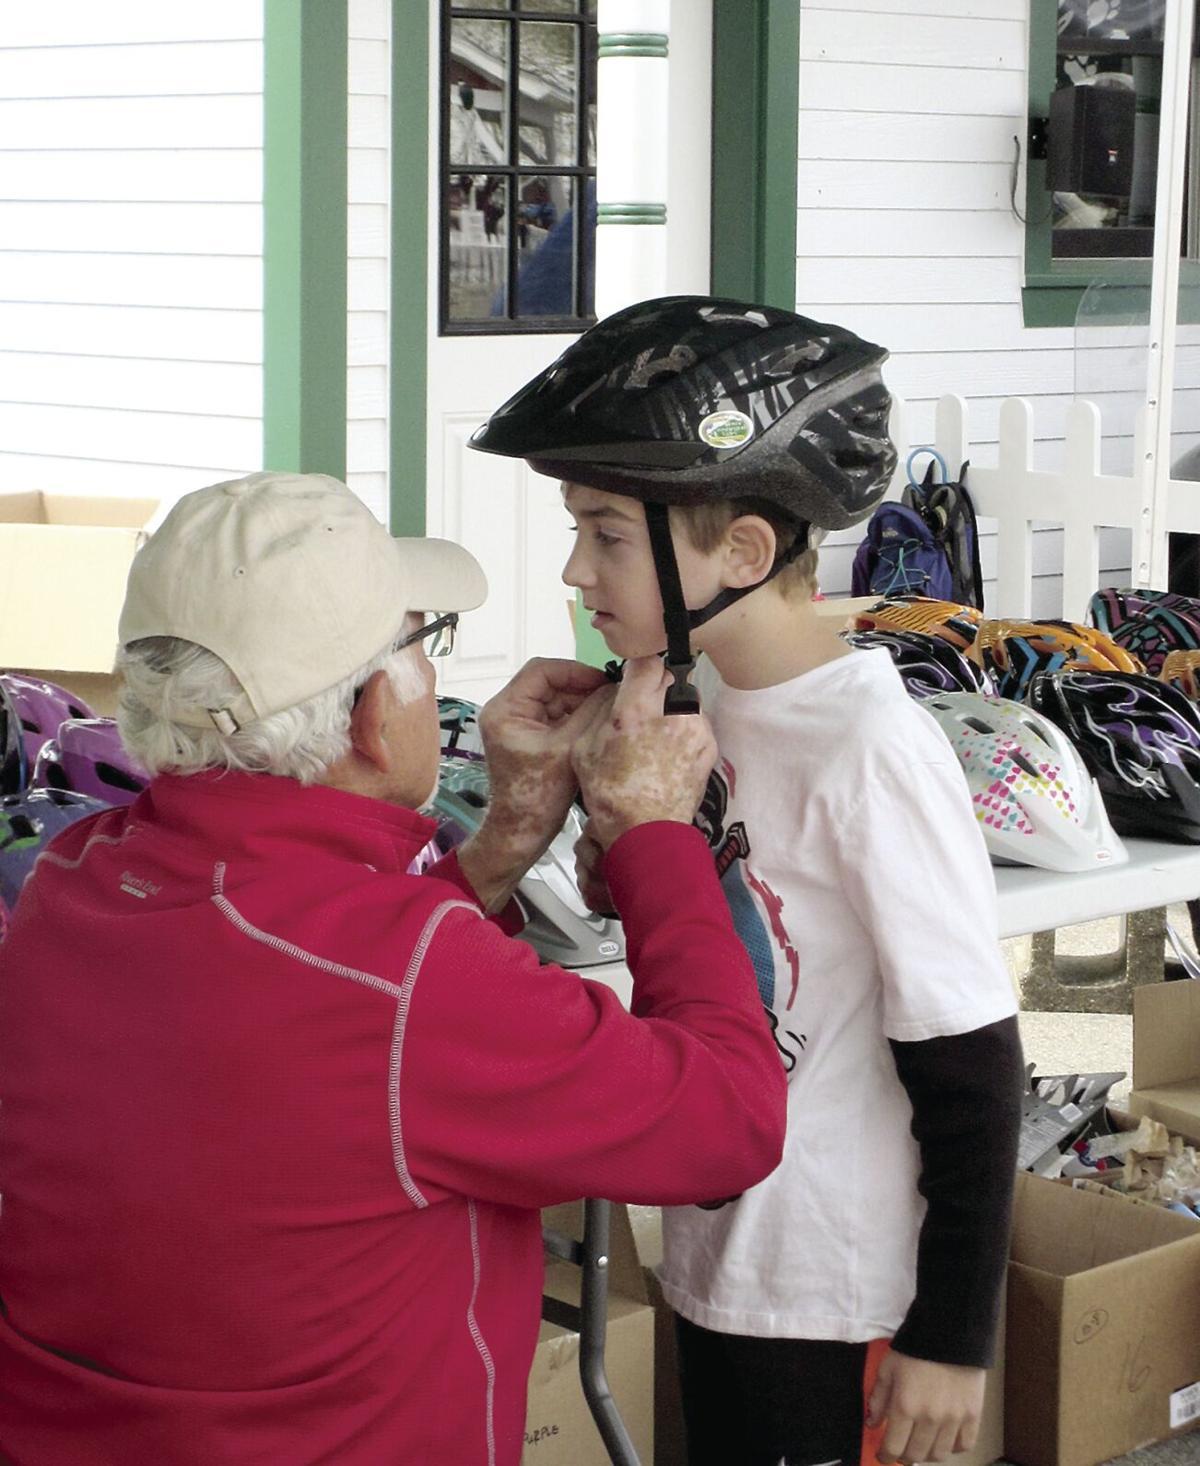 Wheel Family Fun - Kids' Bike Safety Day at Story Land